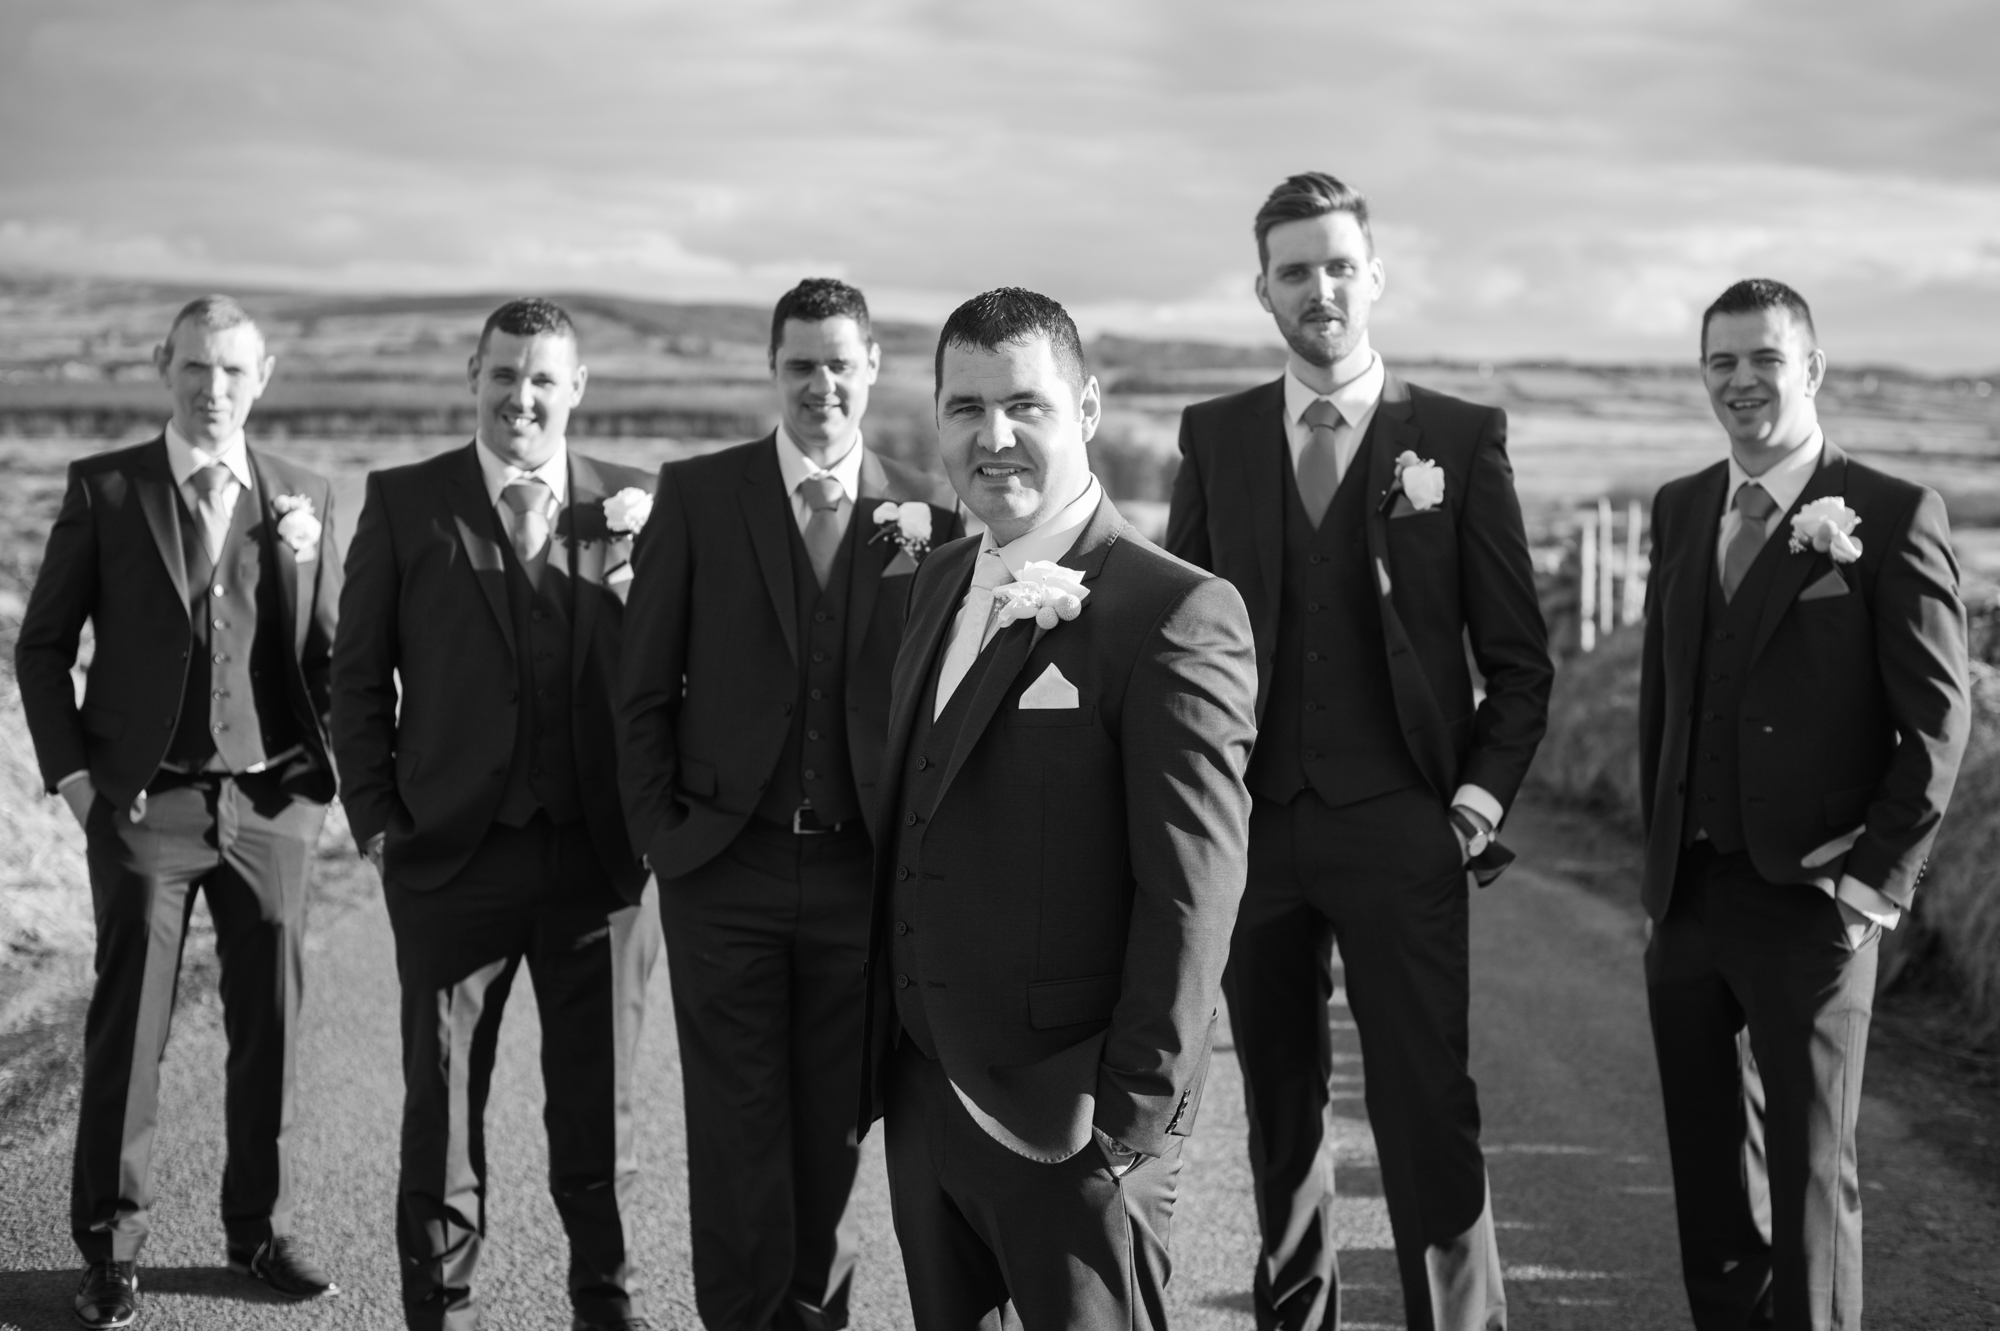 Michael_Gill_Photography_Wedding_Greencastle_Lousie_Jason_Donegal-16.jpg